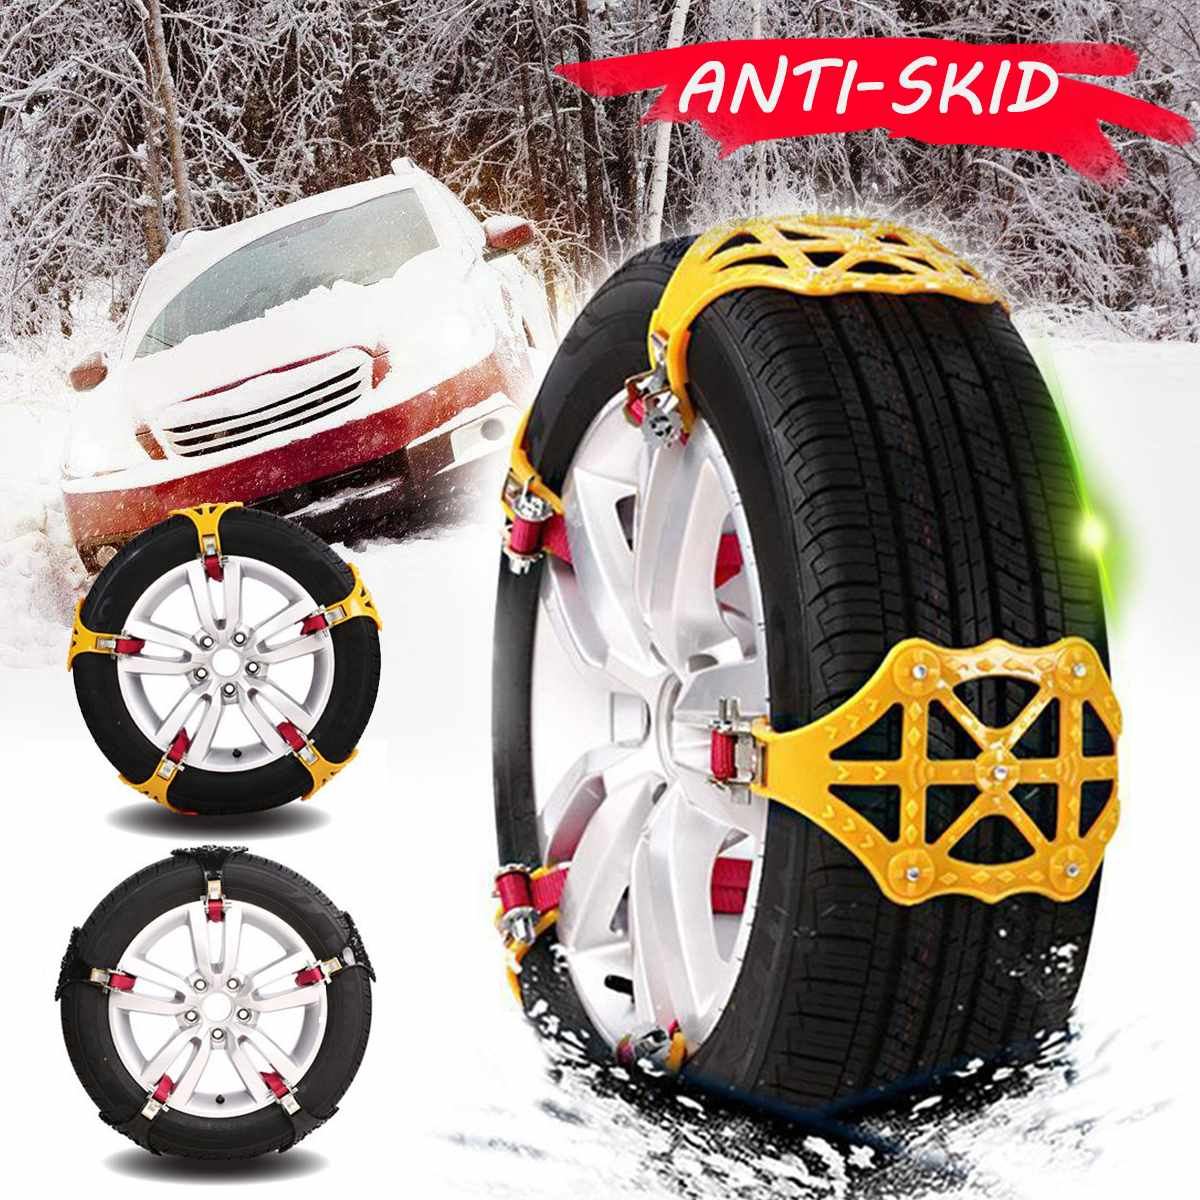 Winter Universal Car Tire Anti Skip Snow Chain Cars Trucks Wheels Tyres Roadway Safety Tire Chains Sand Mud Road Anti-slip Belt